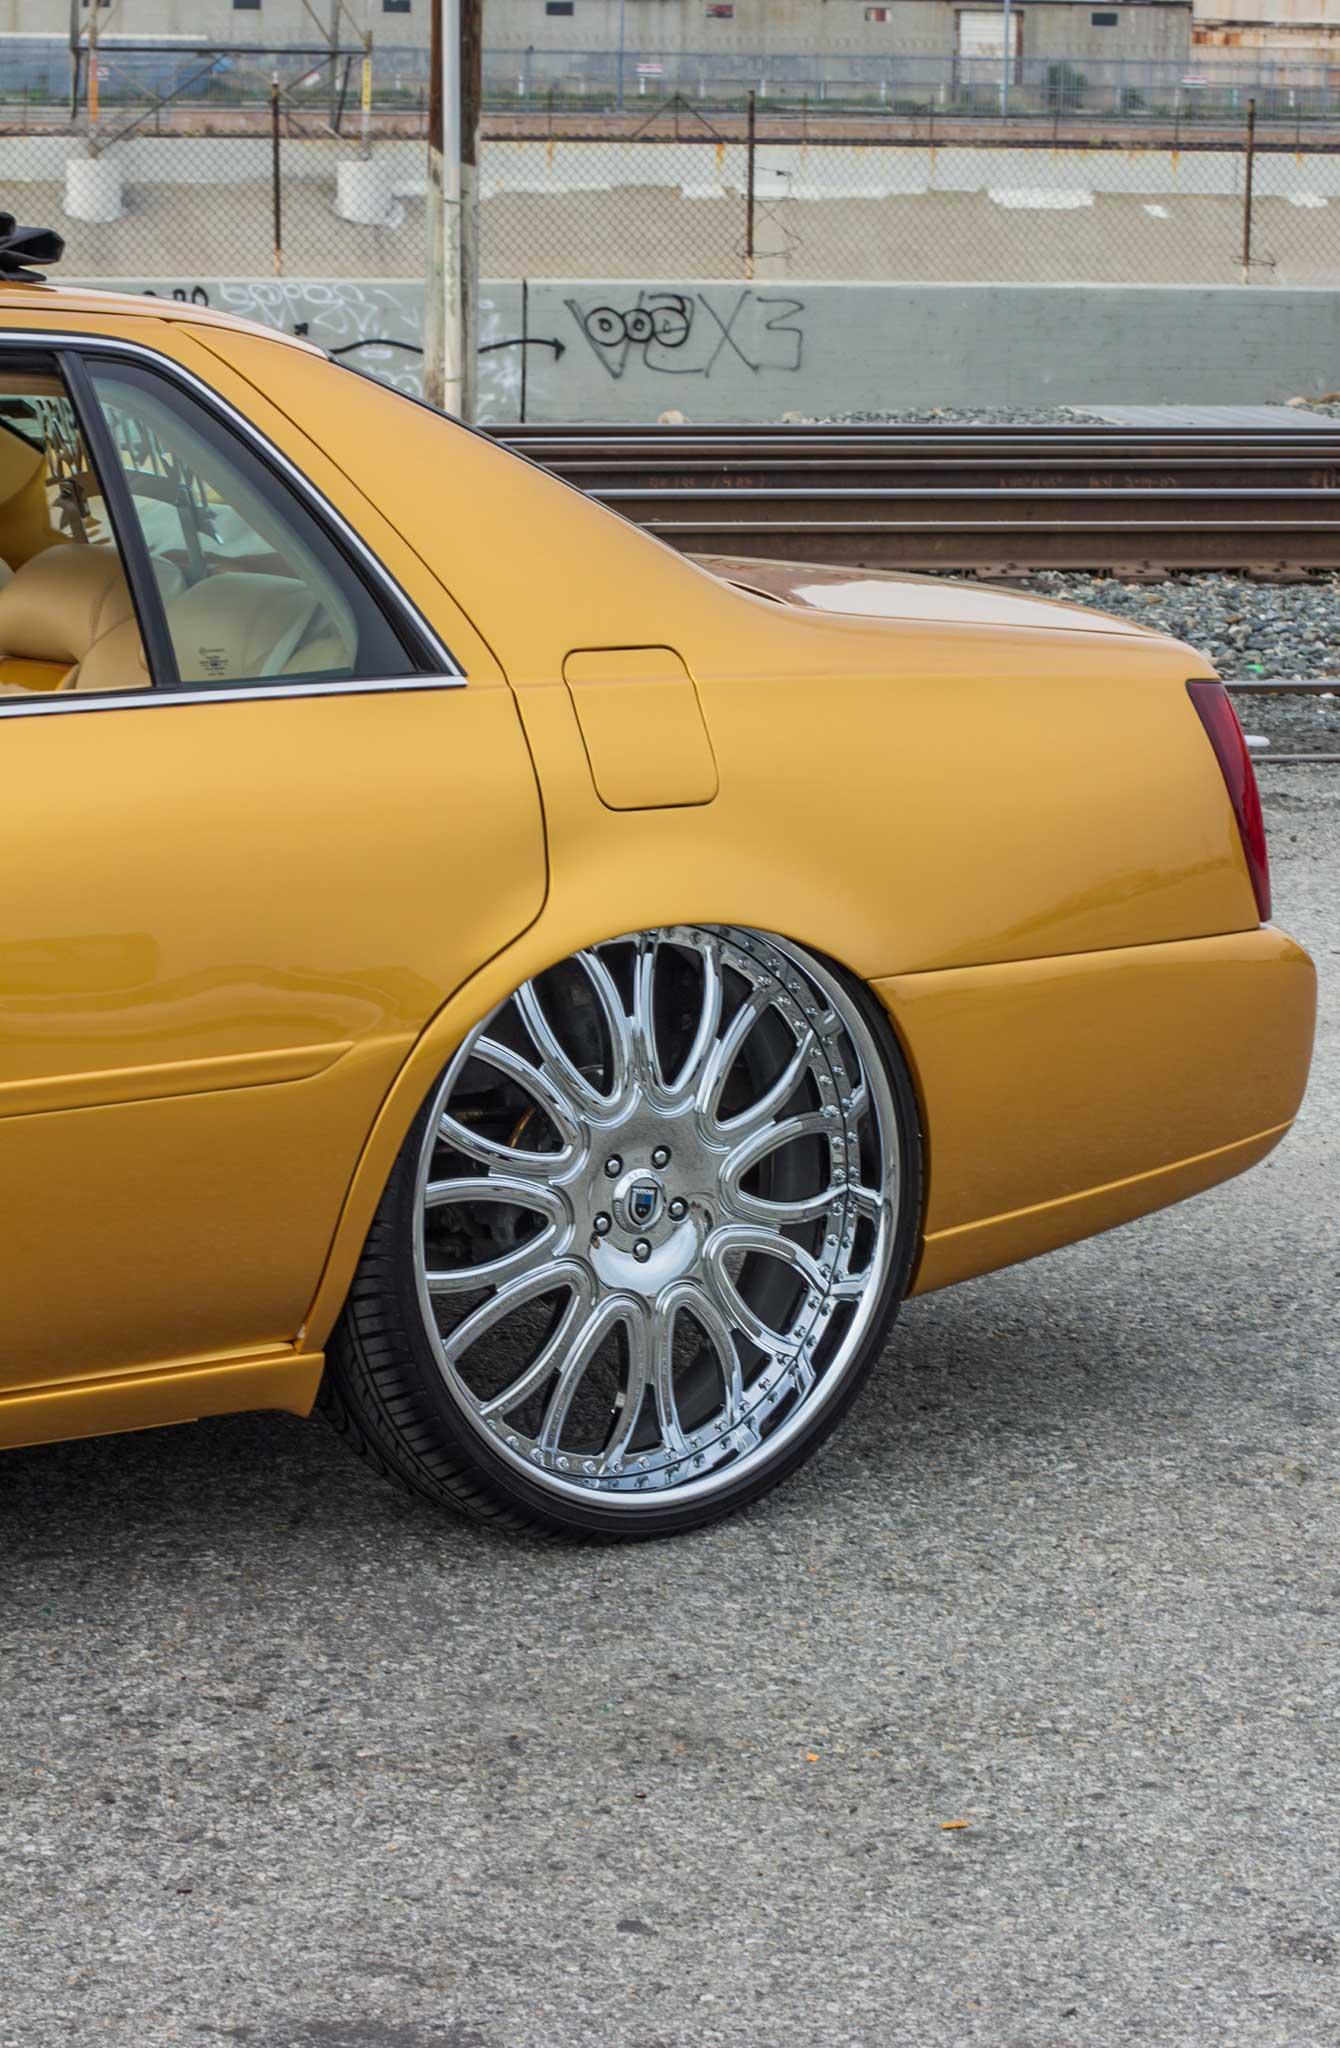 Cadillac On 26 Inch Rims : Cadillac on inch rims pictures to pin pinterest